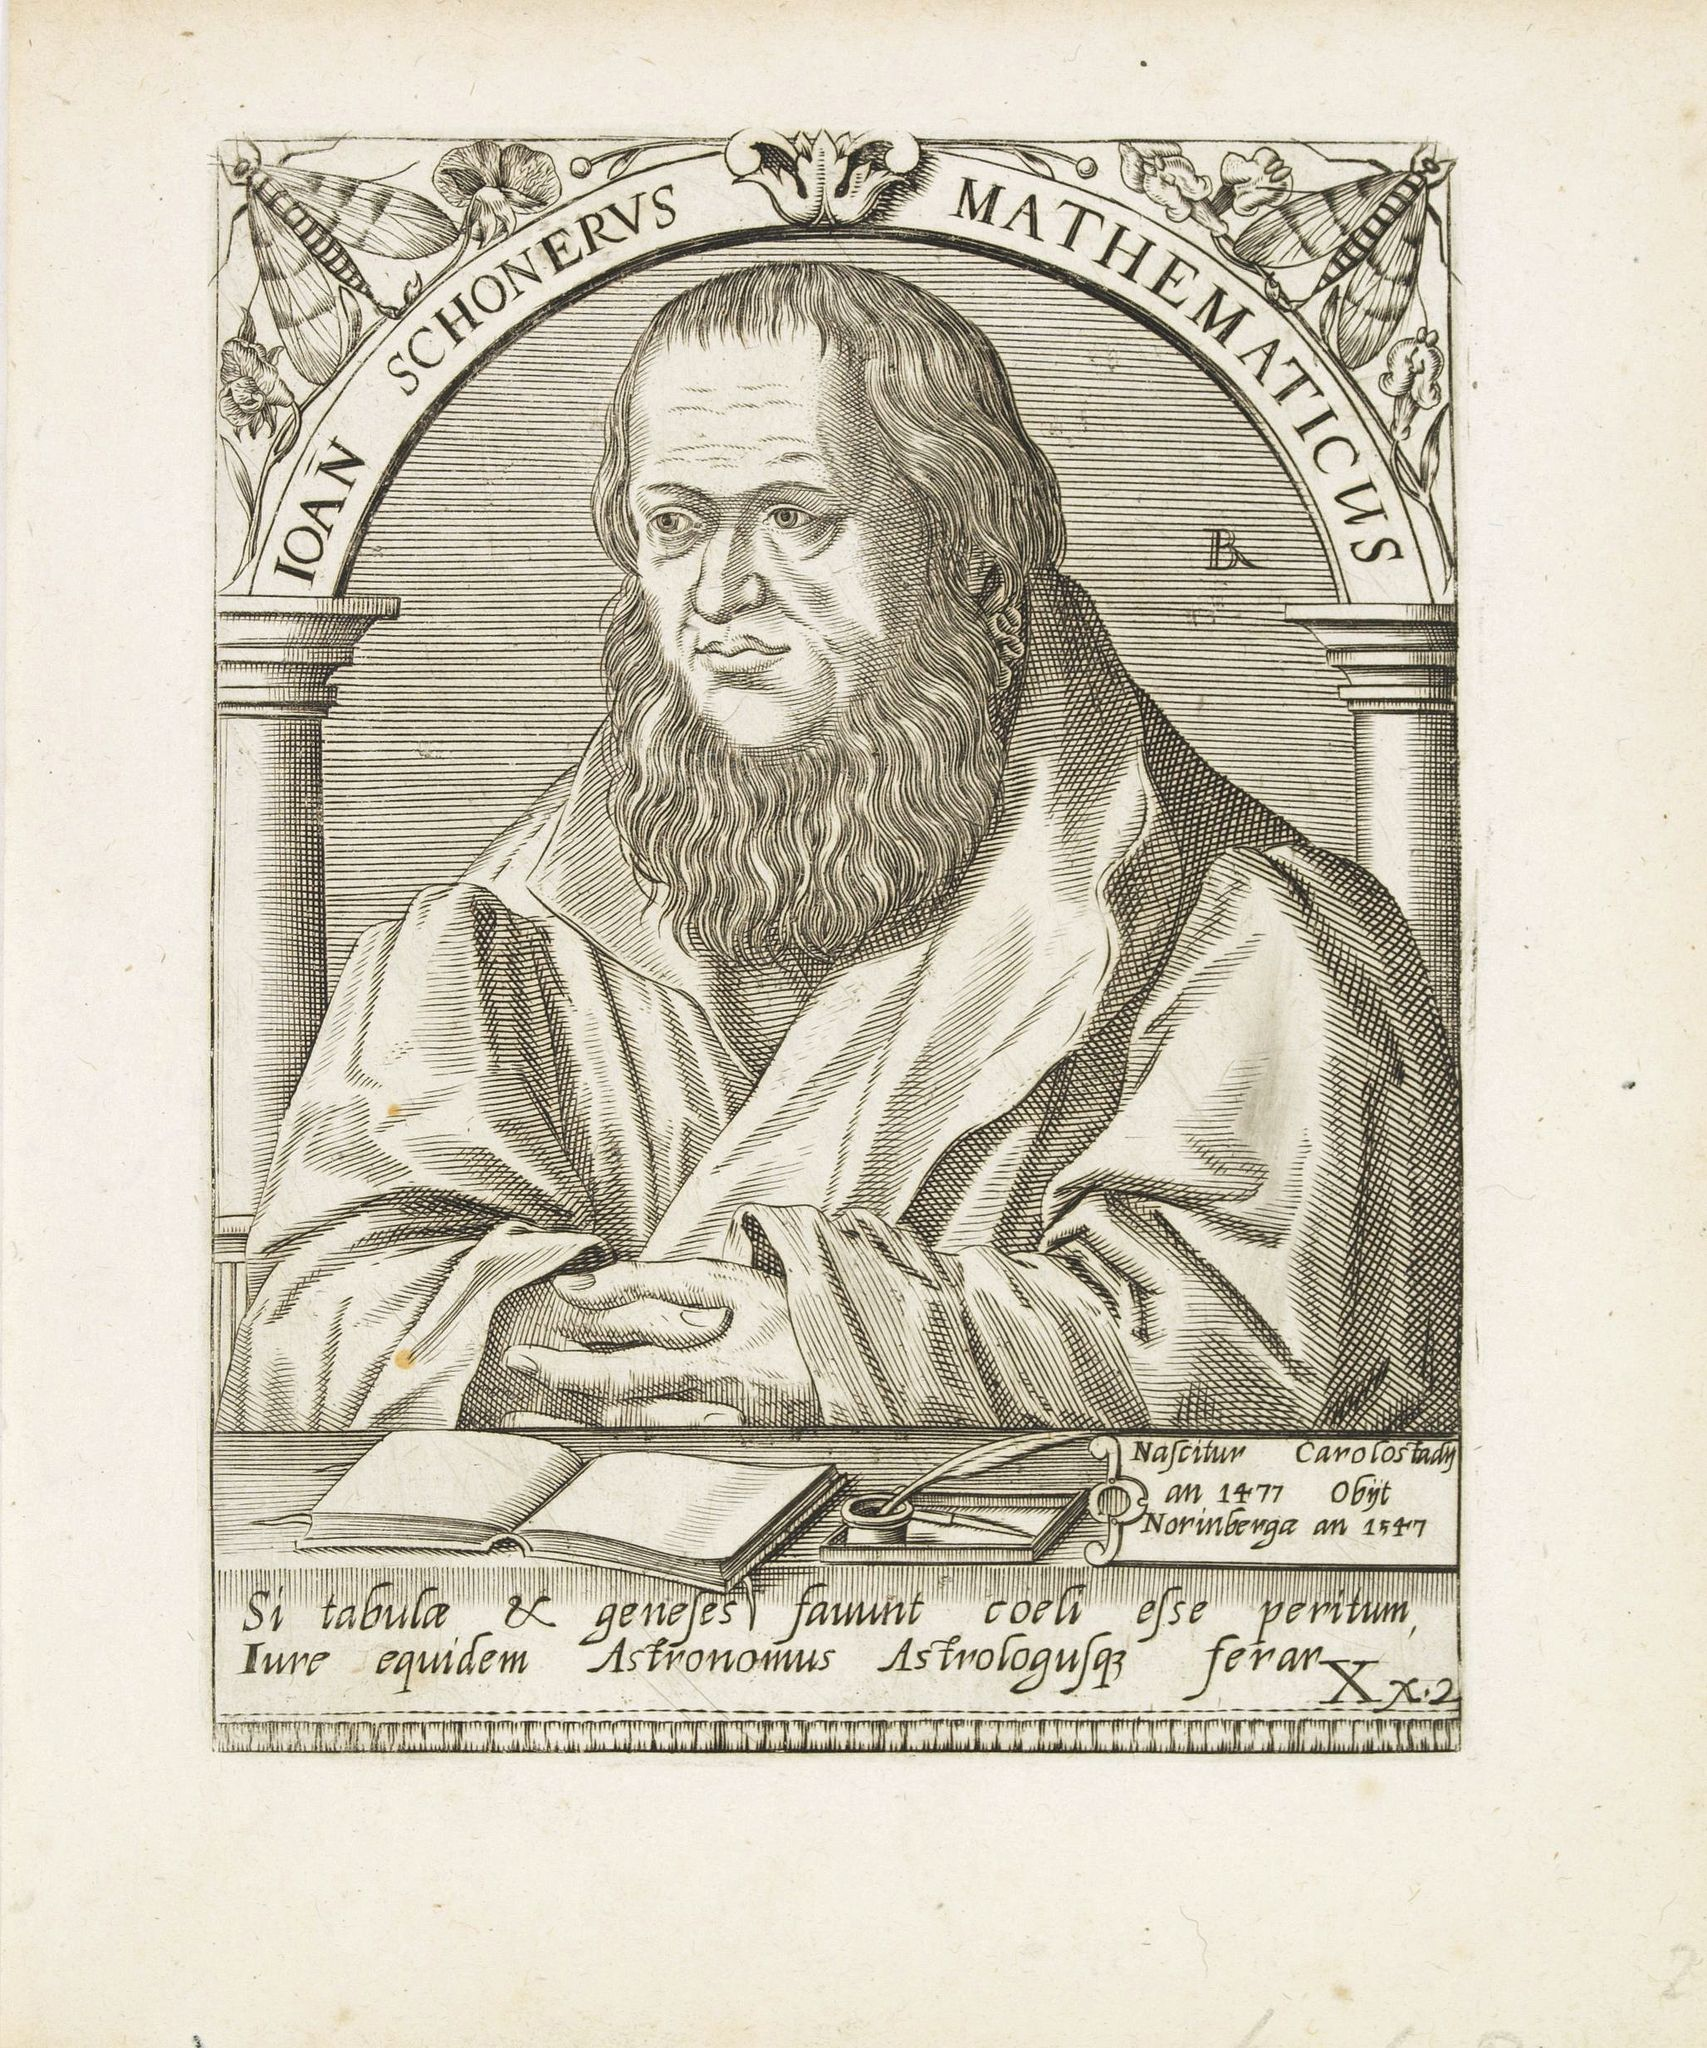 DE BRY, Th. -  Joan Schonerus Mathematicus.